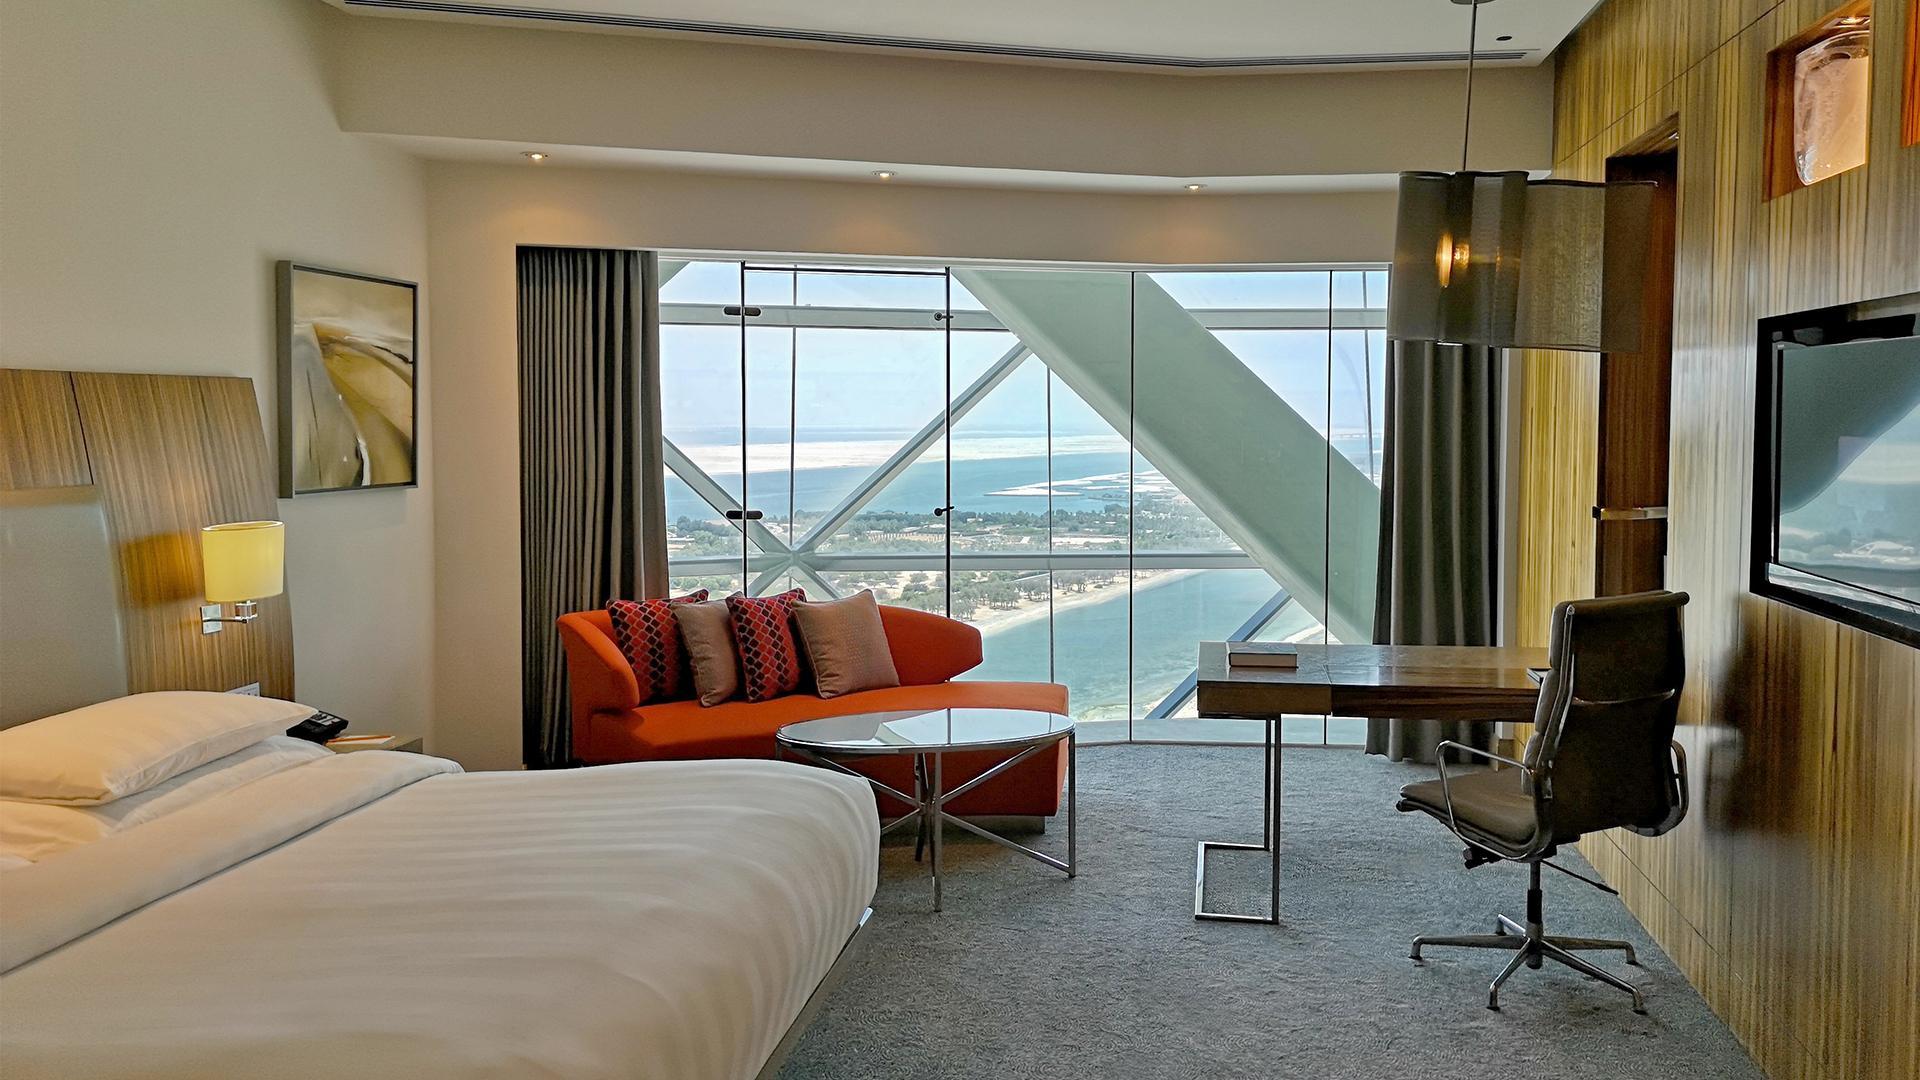 Standard Room image 1 at Andaz Capital Gate, Abu Dhabi — a concept by Hyatt by null, Abu Dhabi, United Arab Emirates